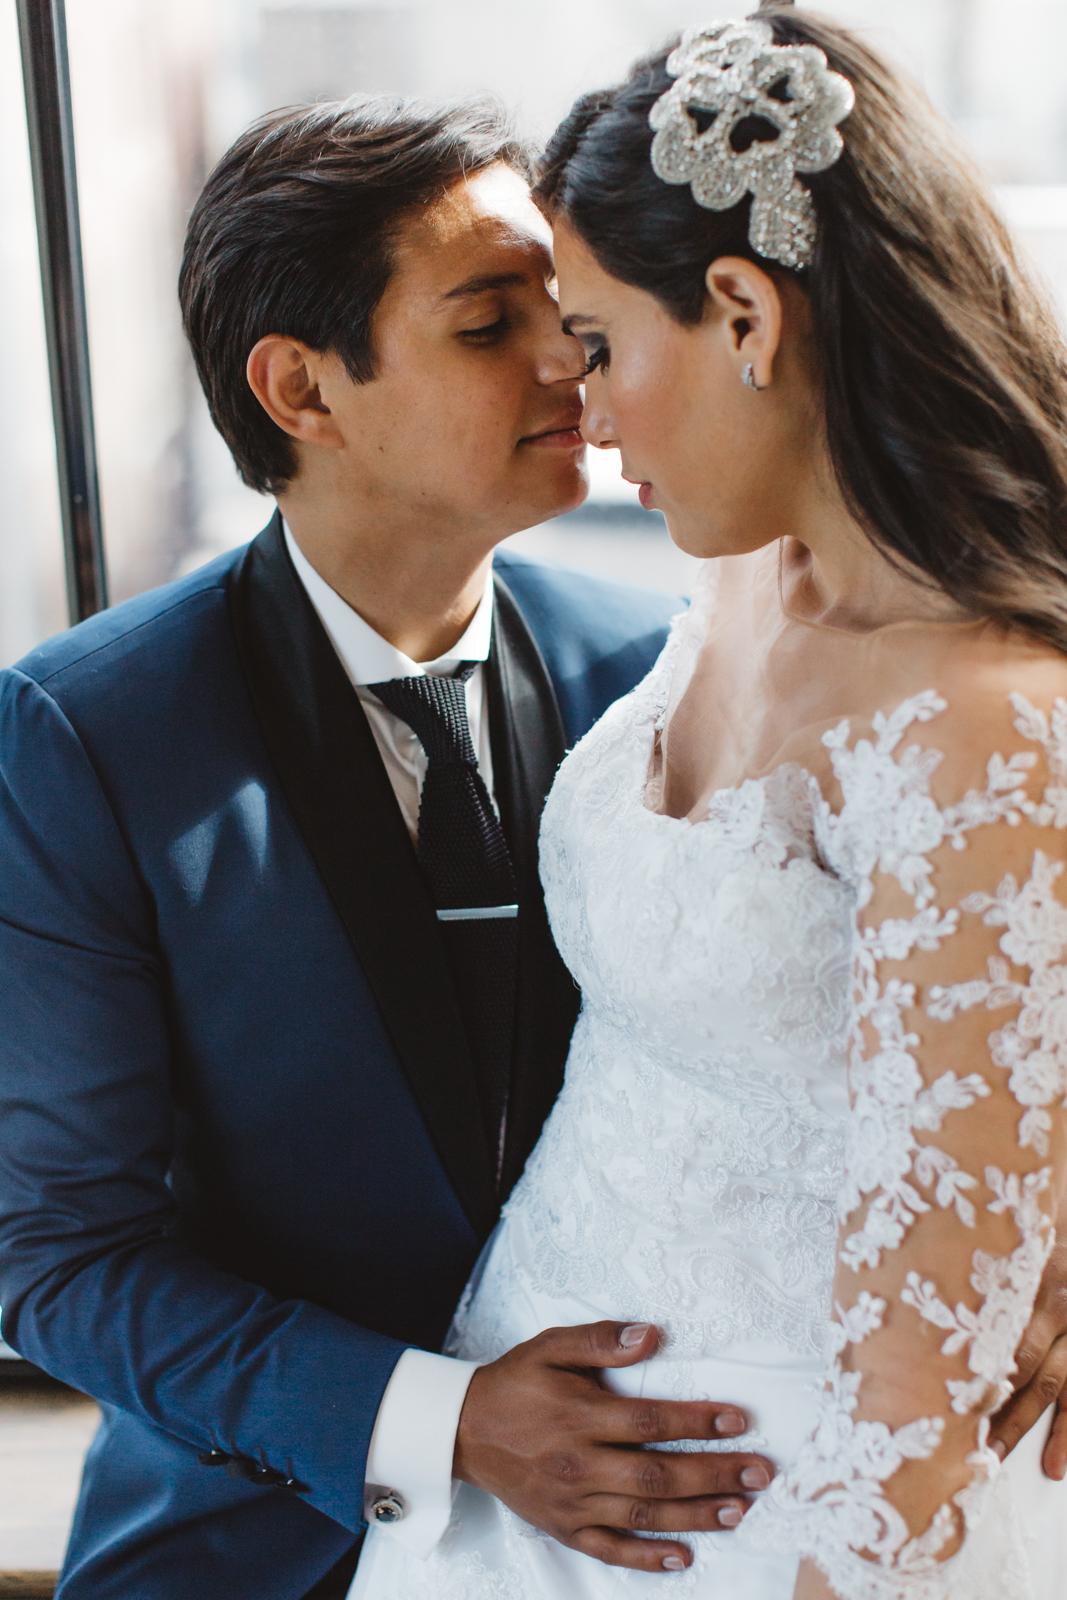 NYC Wedding Photography Lofts at Prince Brooklyn NYC Photographer Boris Zaretsky _B2C5311.jpg